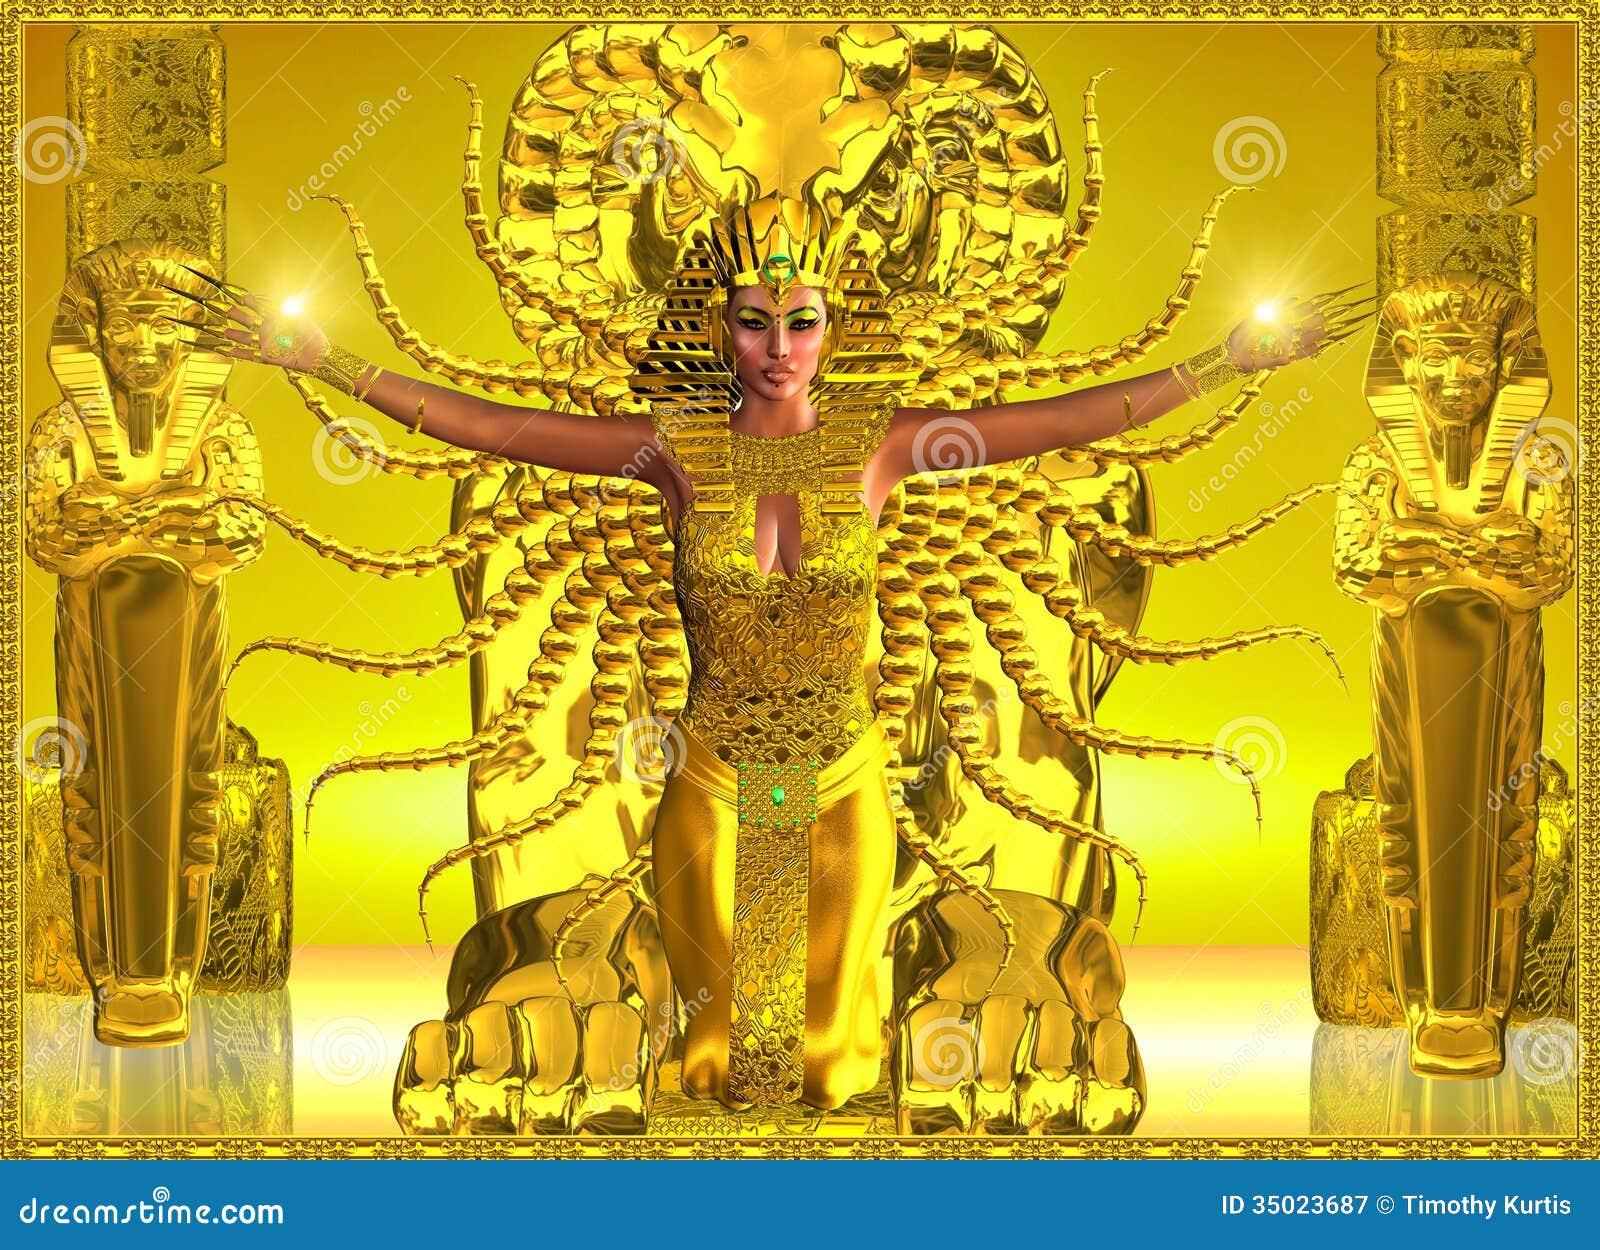 ancient egyptians gods and goddess